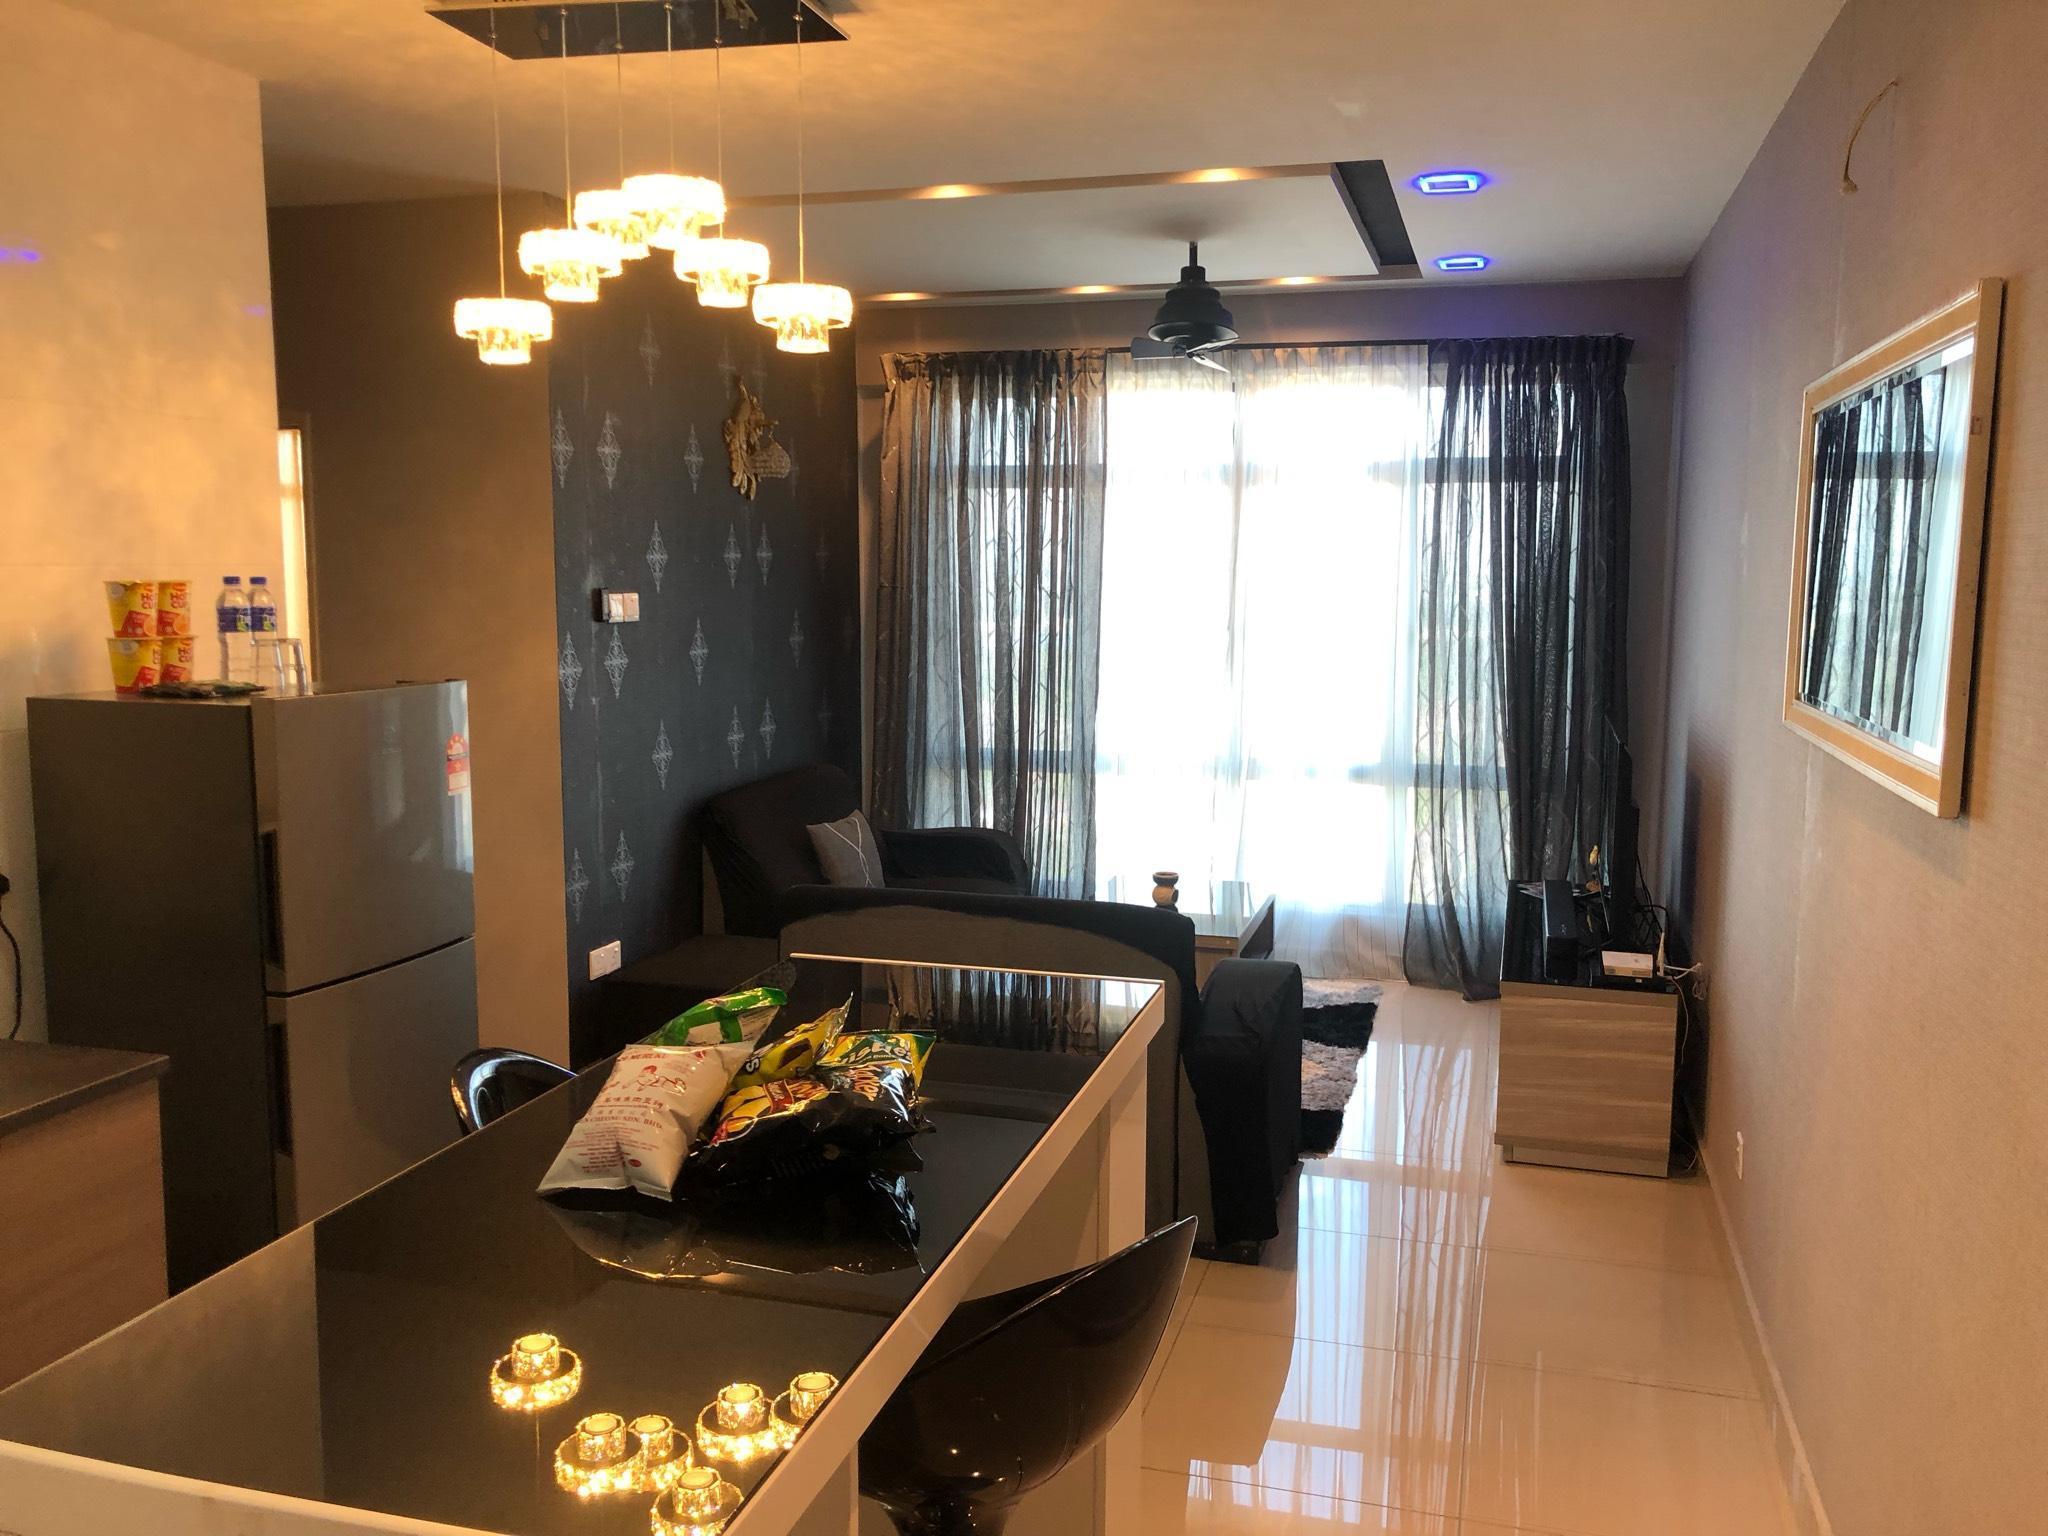 Bahaamas Arc Austin Hills Entire Apartment Johor Bahru Deals Photos Reviews